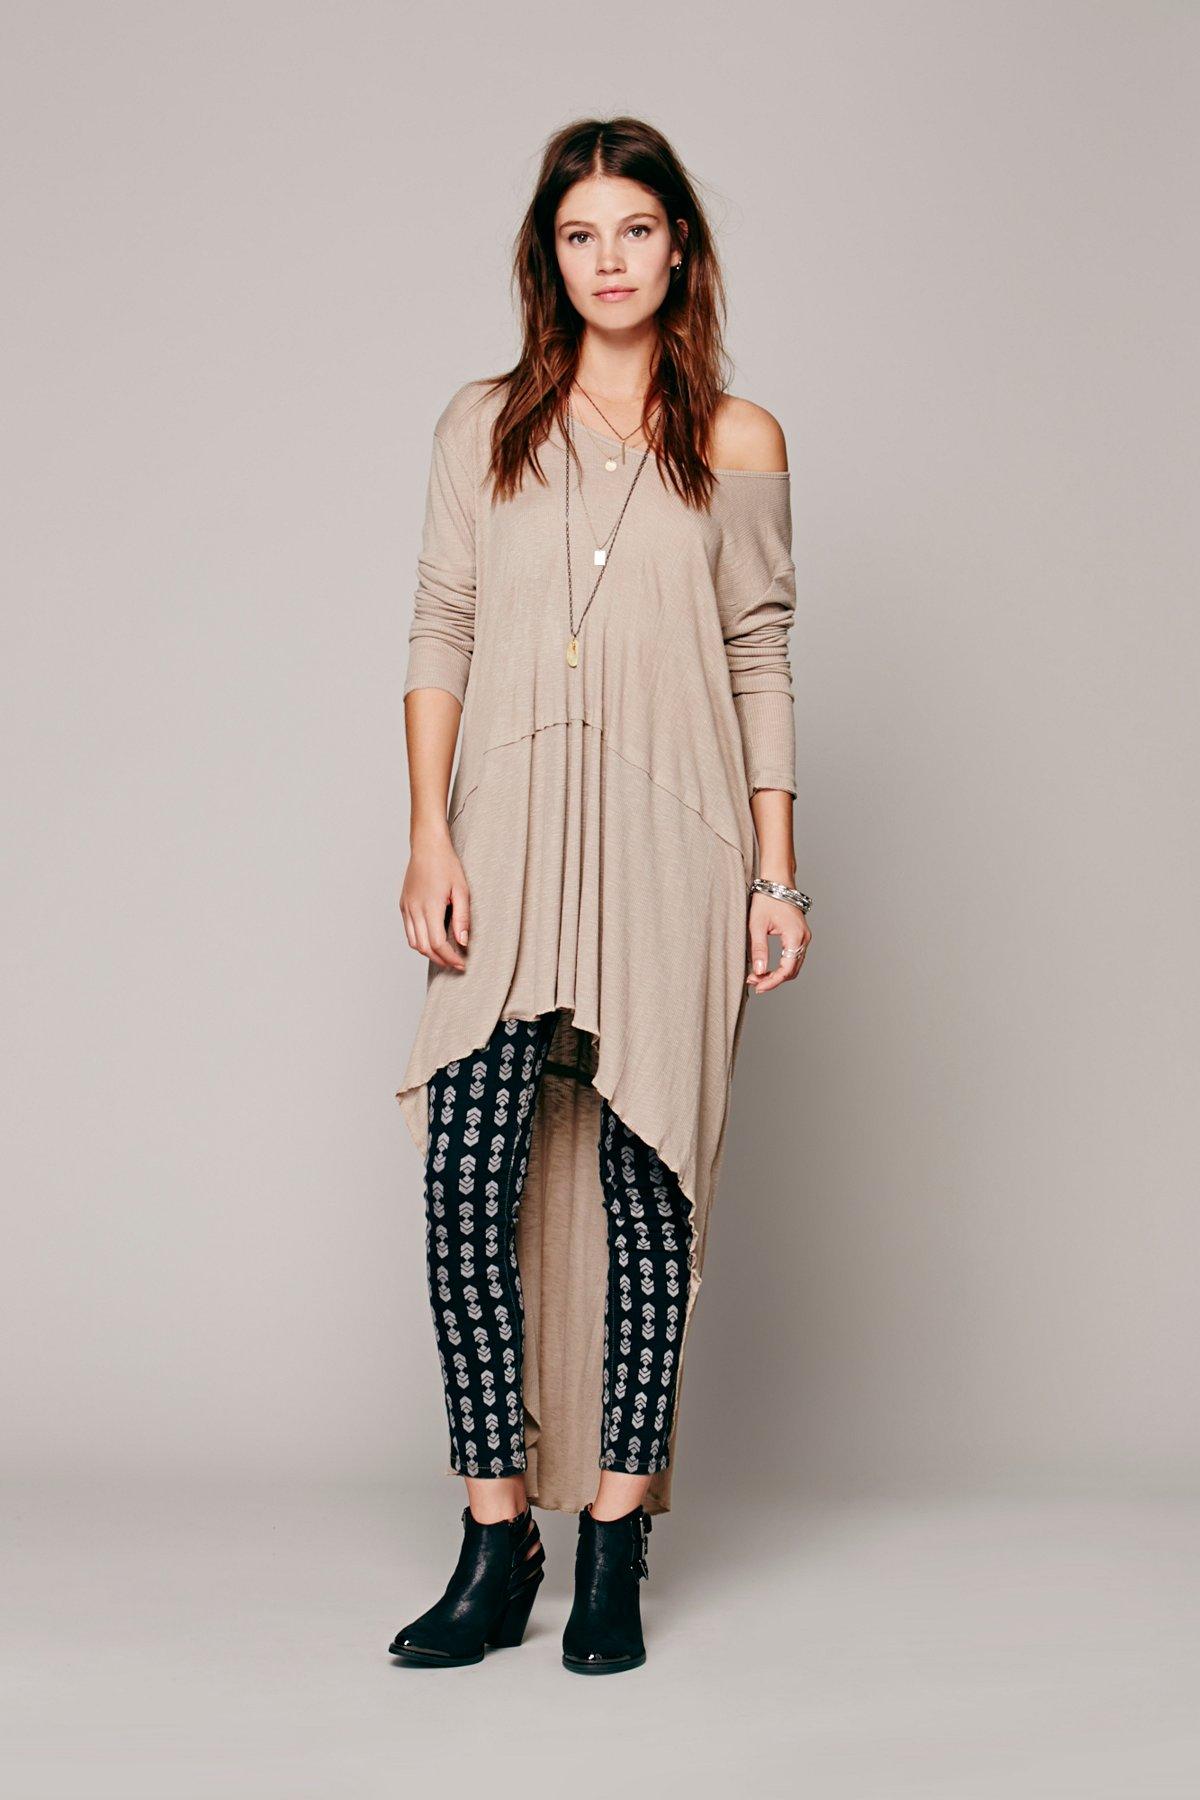 Amy's Long Sleeve Tee Dress